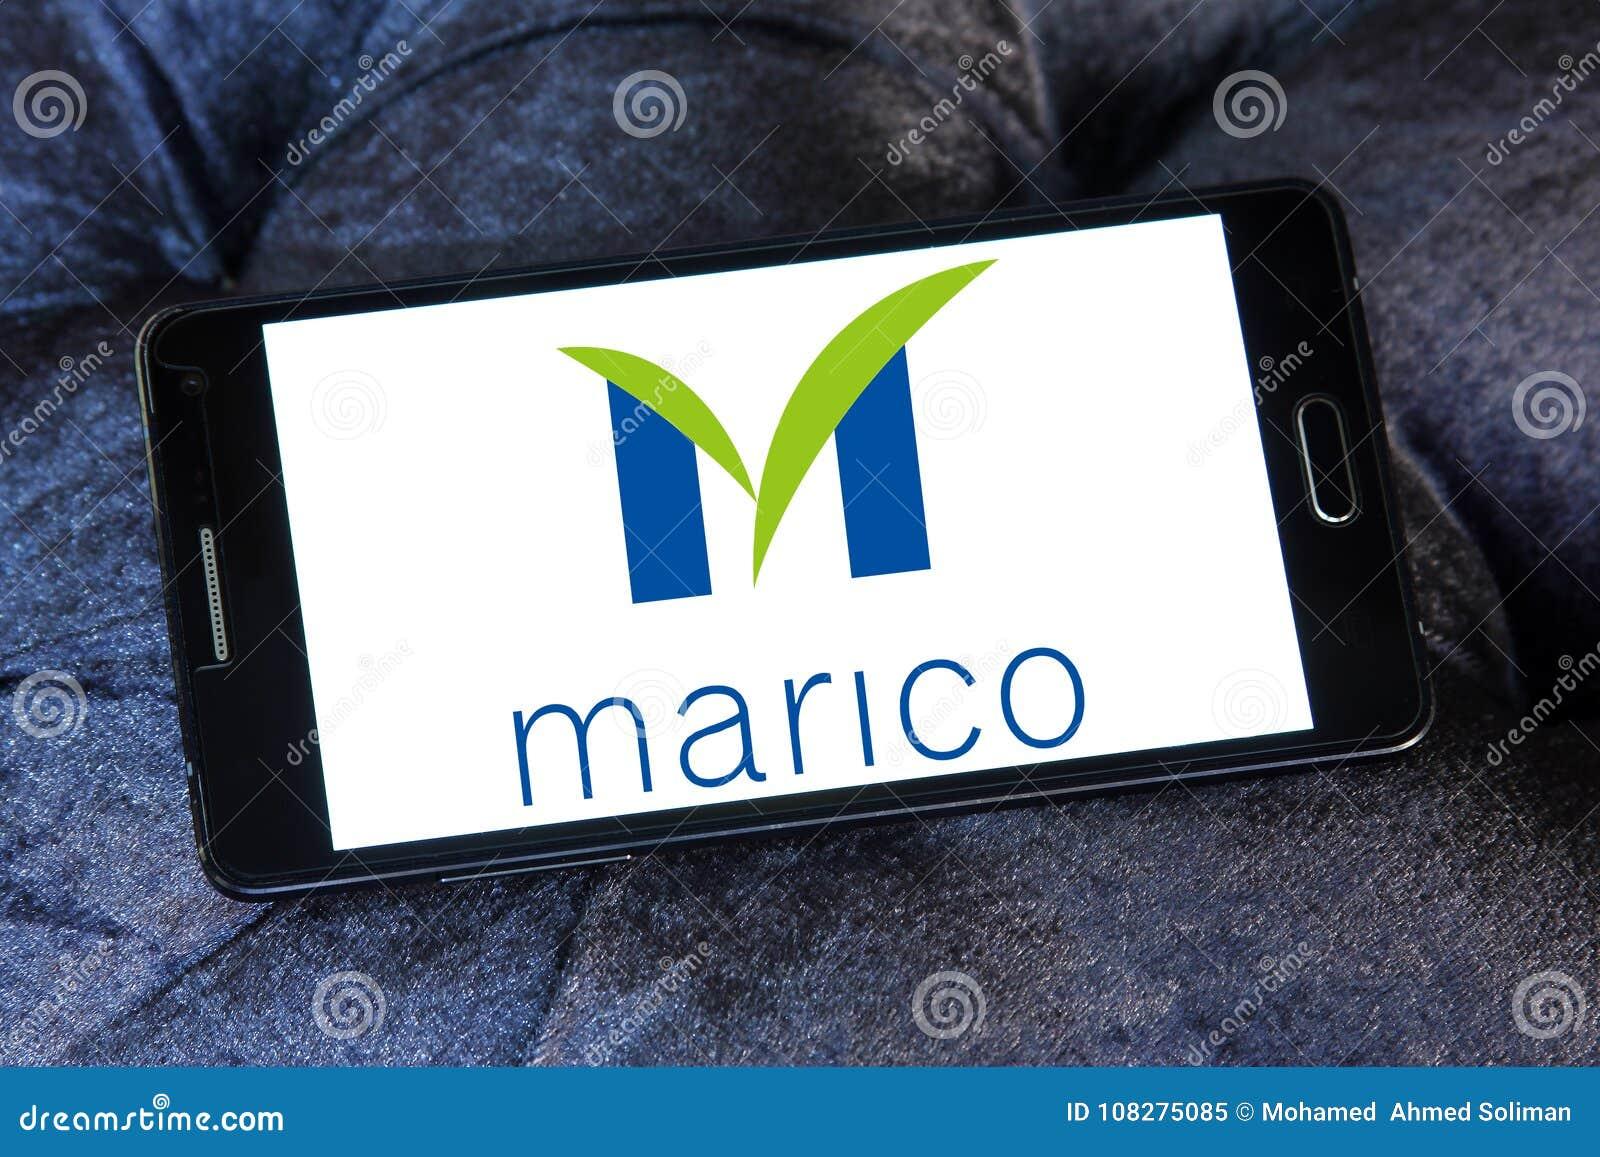 Marico goods company logo editorial image  Image of logotype